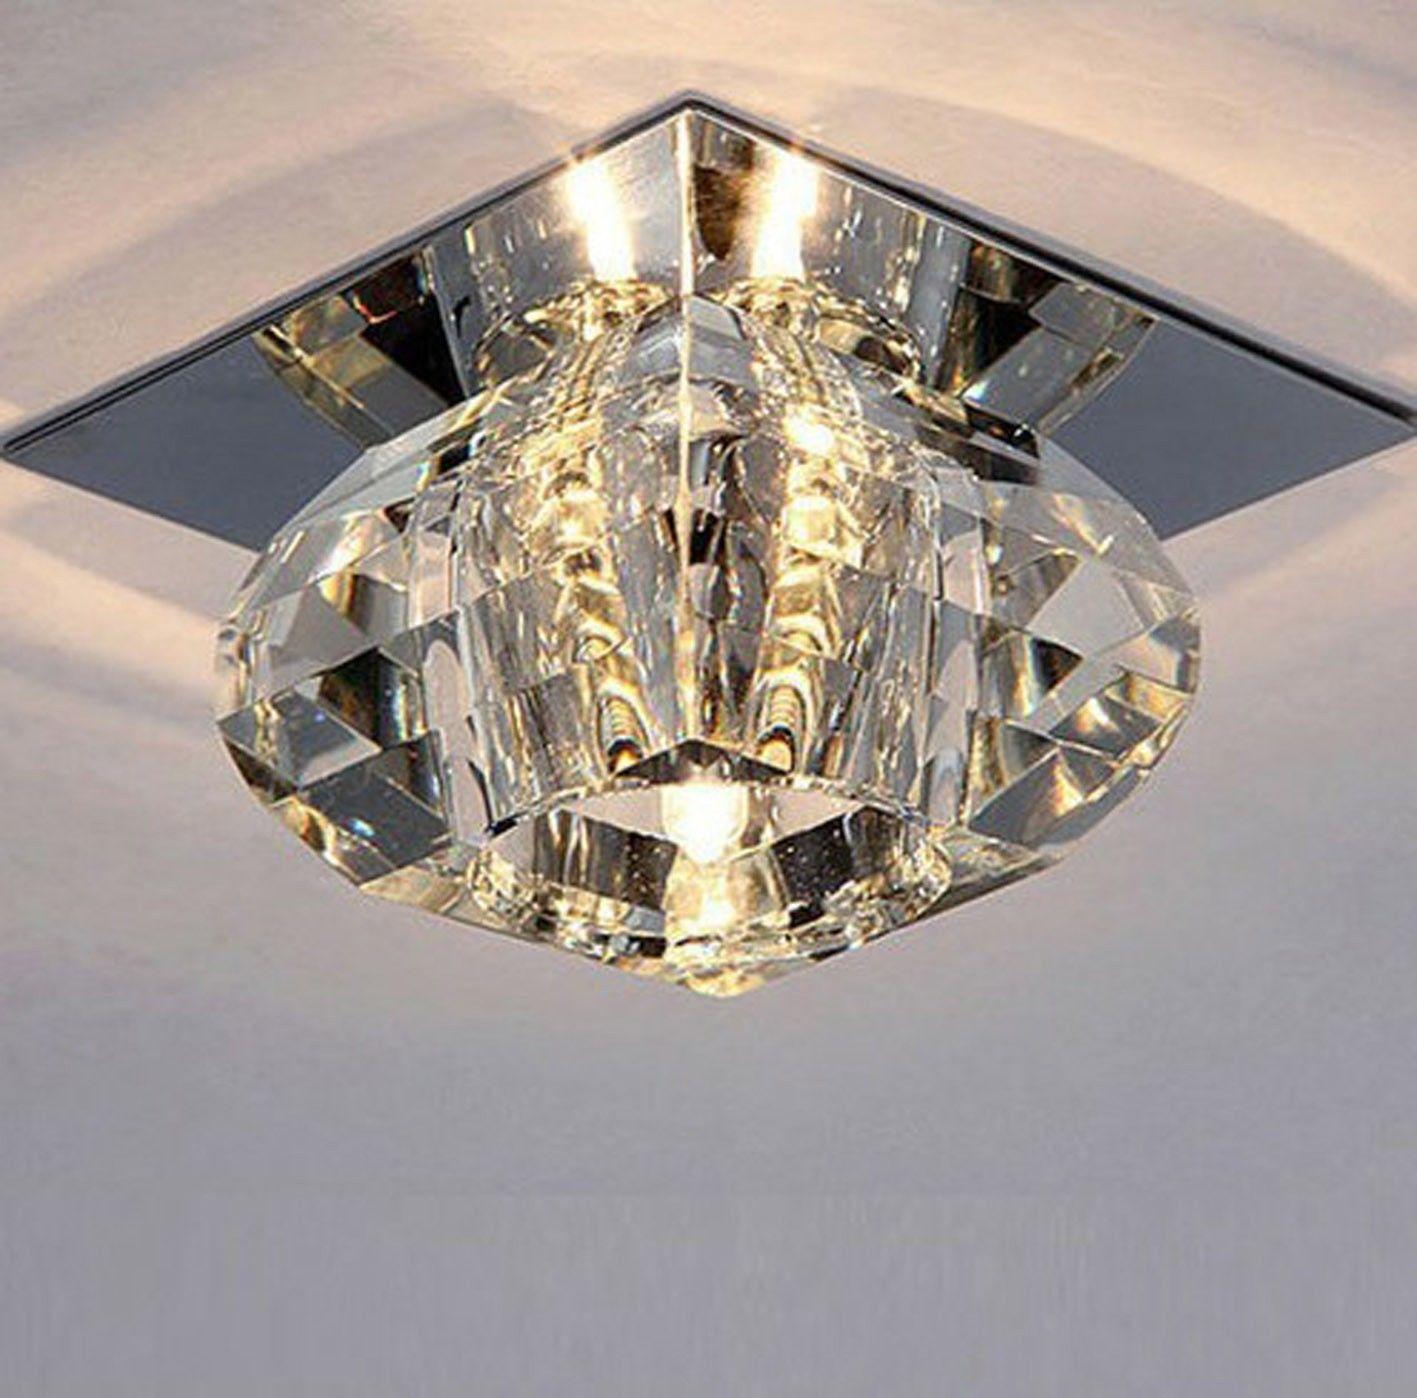 New Modern Crystal Flower LED Bulb Bulbs Warm White Ceiling Light Pendant Chandelier Decor Decoration<br><br>Aliexpress